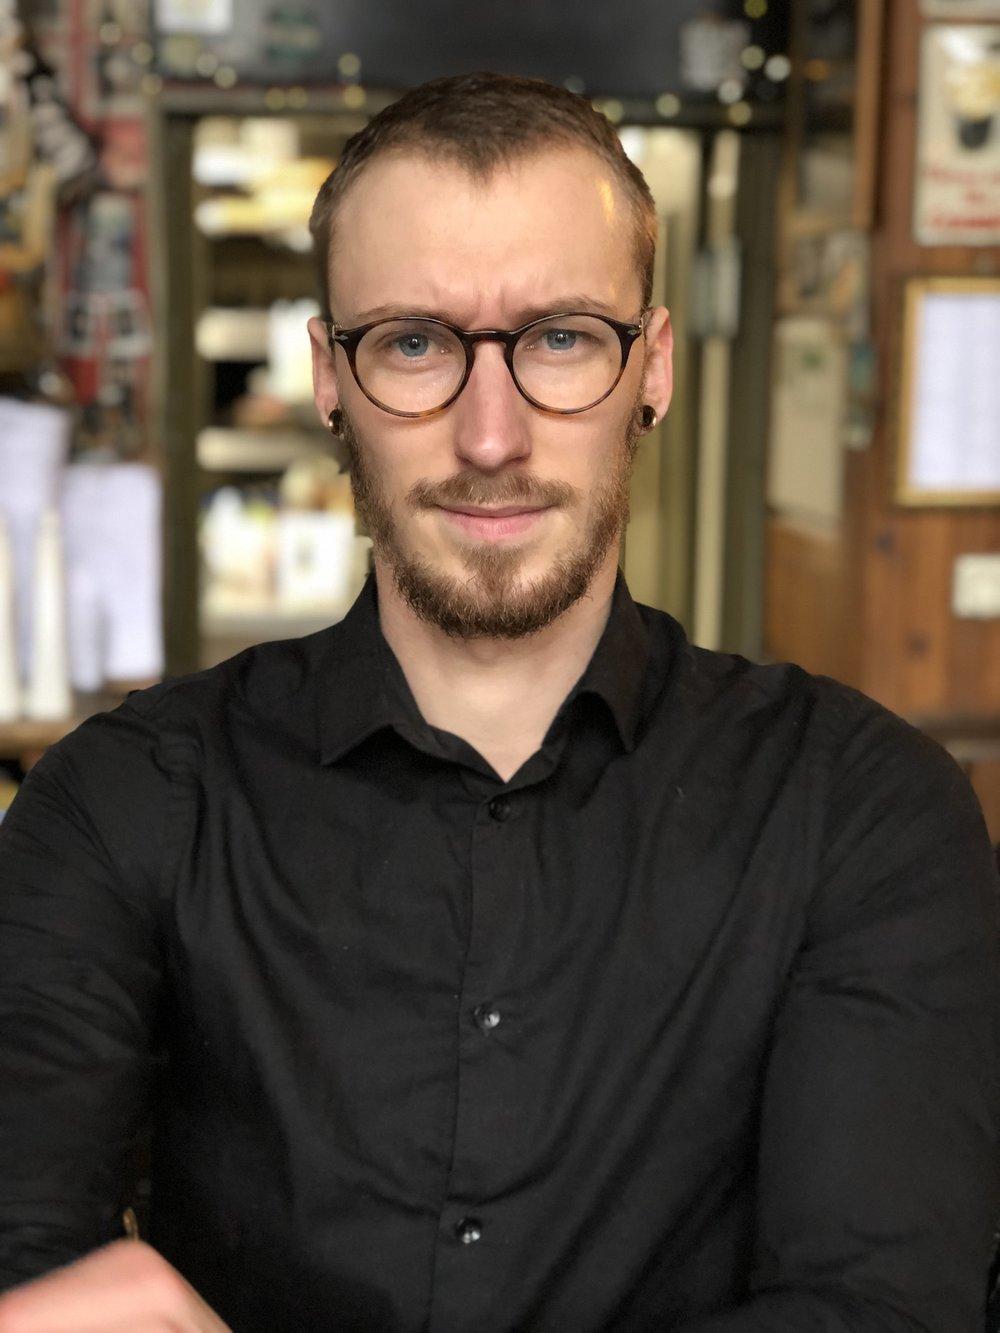 Chriss   Hawley Hero since December 2018